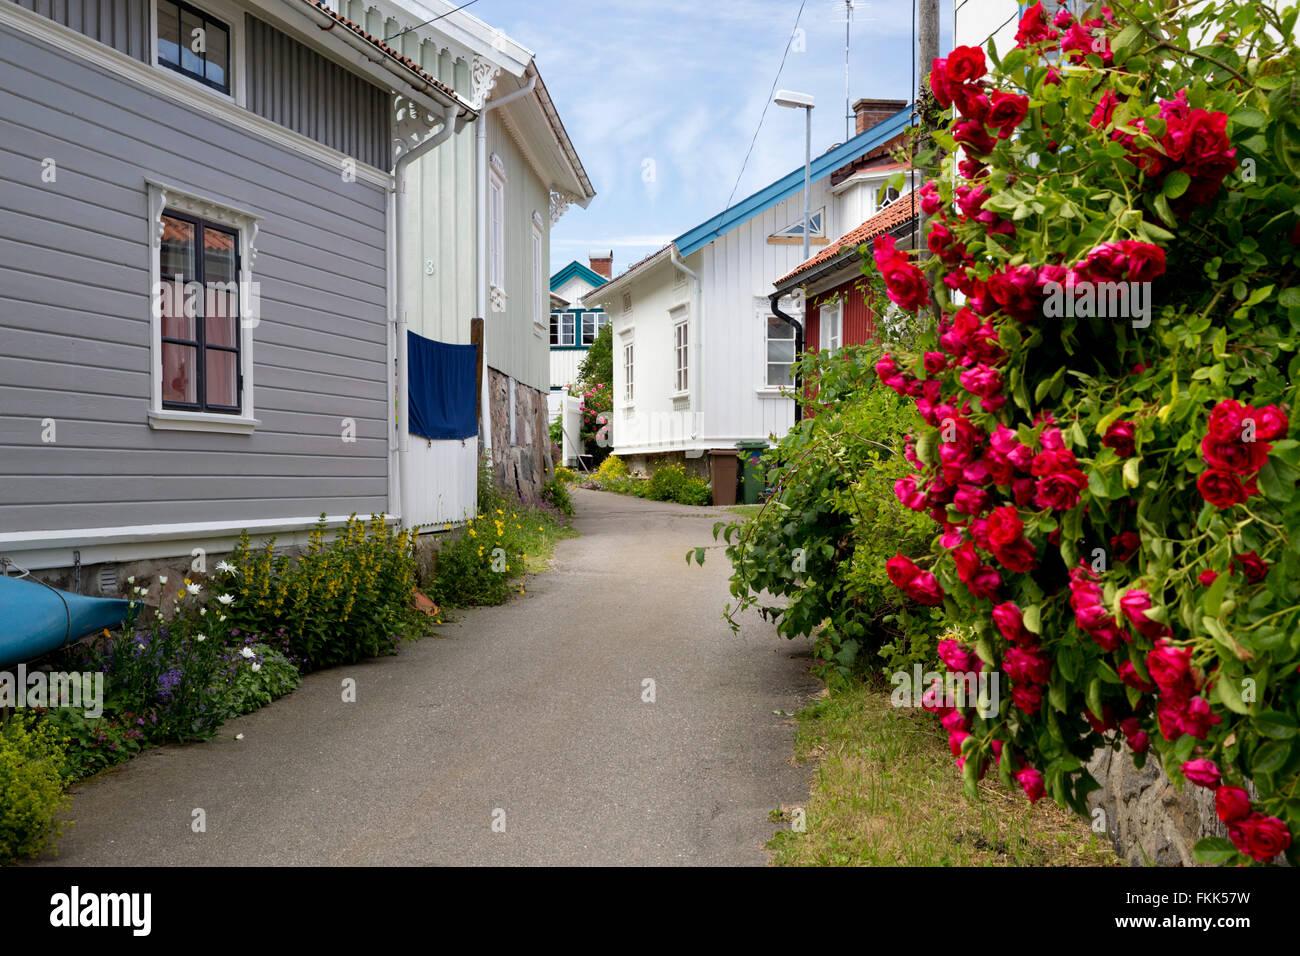 Street scene with red roses, Hälleviksstrand, Orust, Bohuslän Coast, Southwest Sweden, Sweden, Scandinavia, - Stock Image